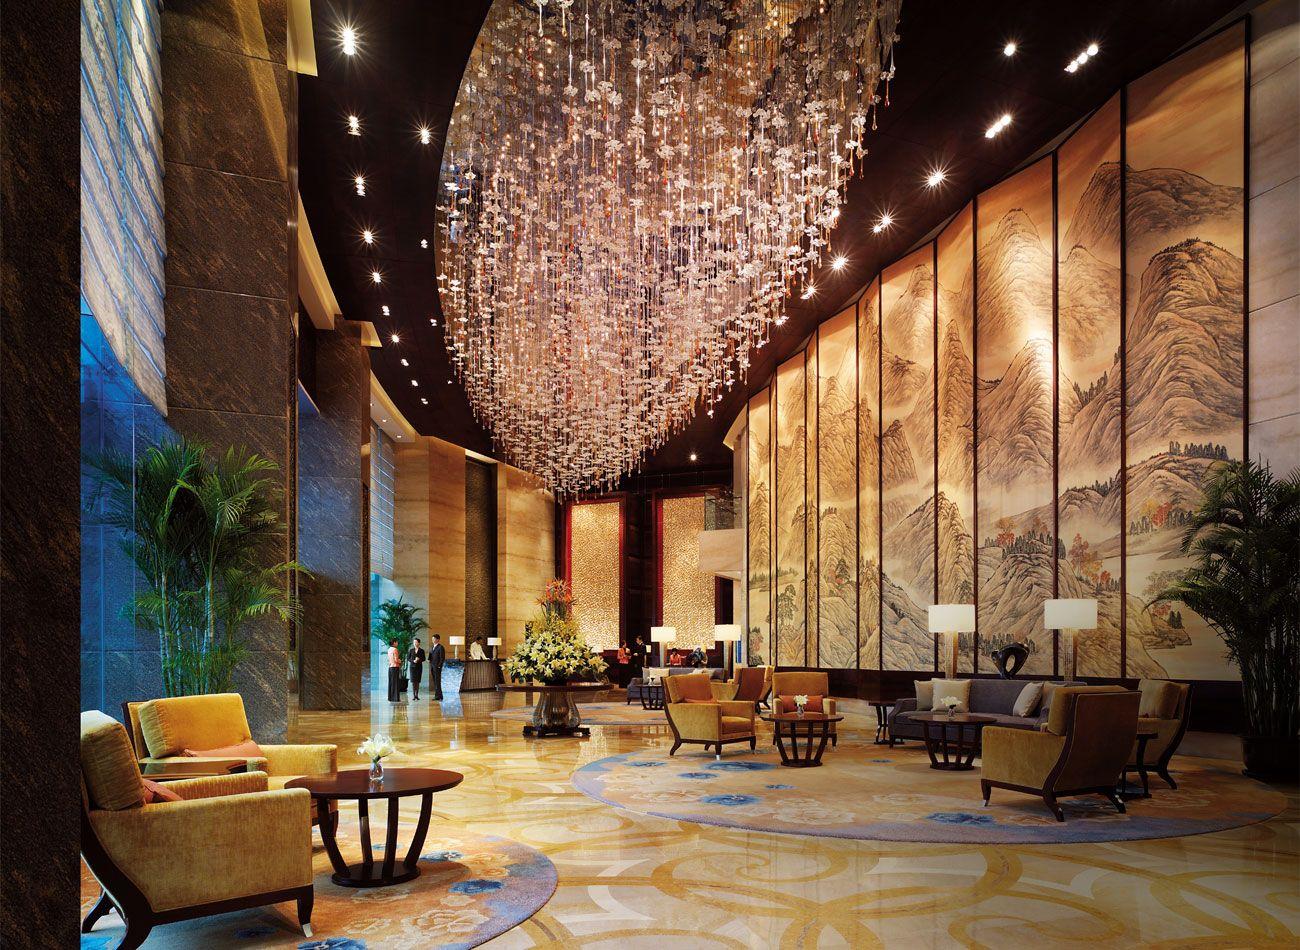 126 Best Shangri La Hotel 香格里拉酒店 Images On Pinterest Luxury Hotels And Interiors